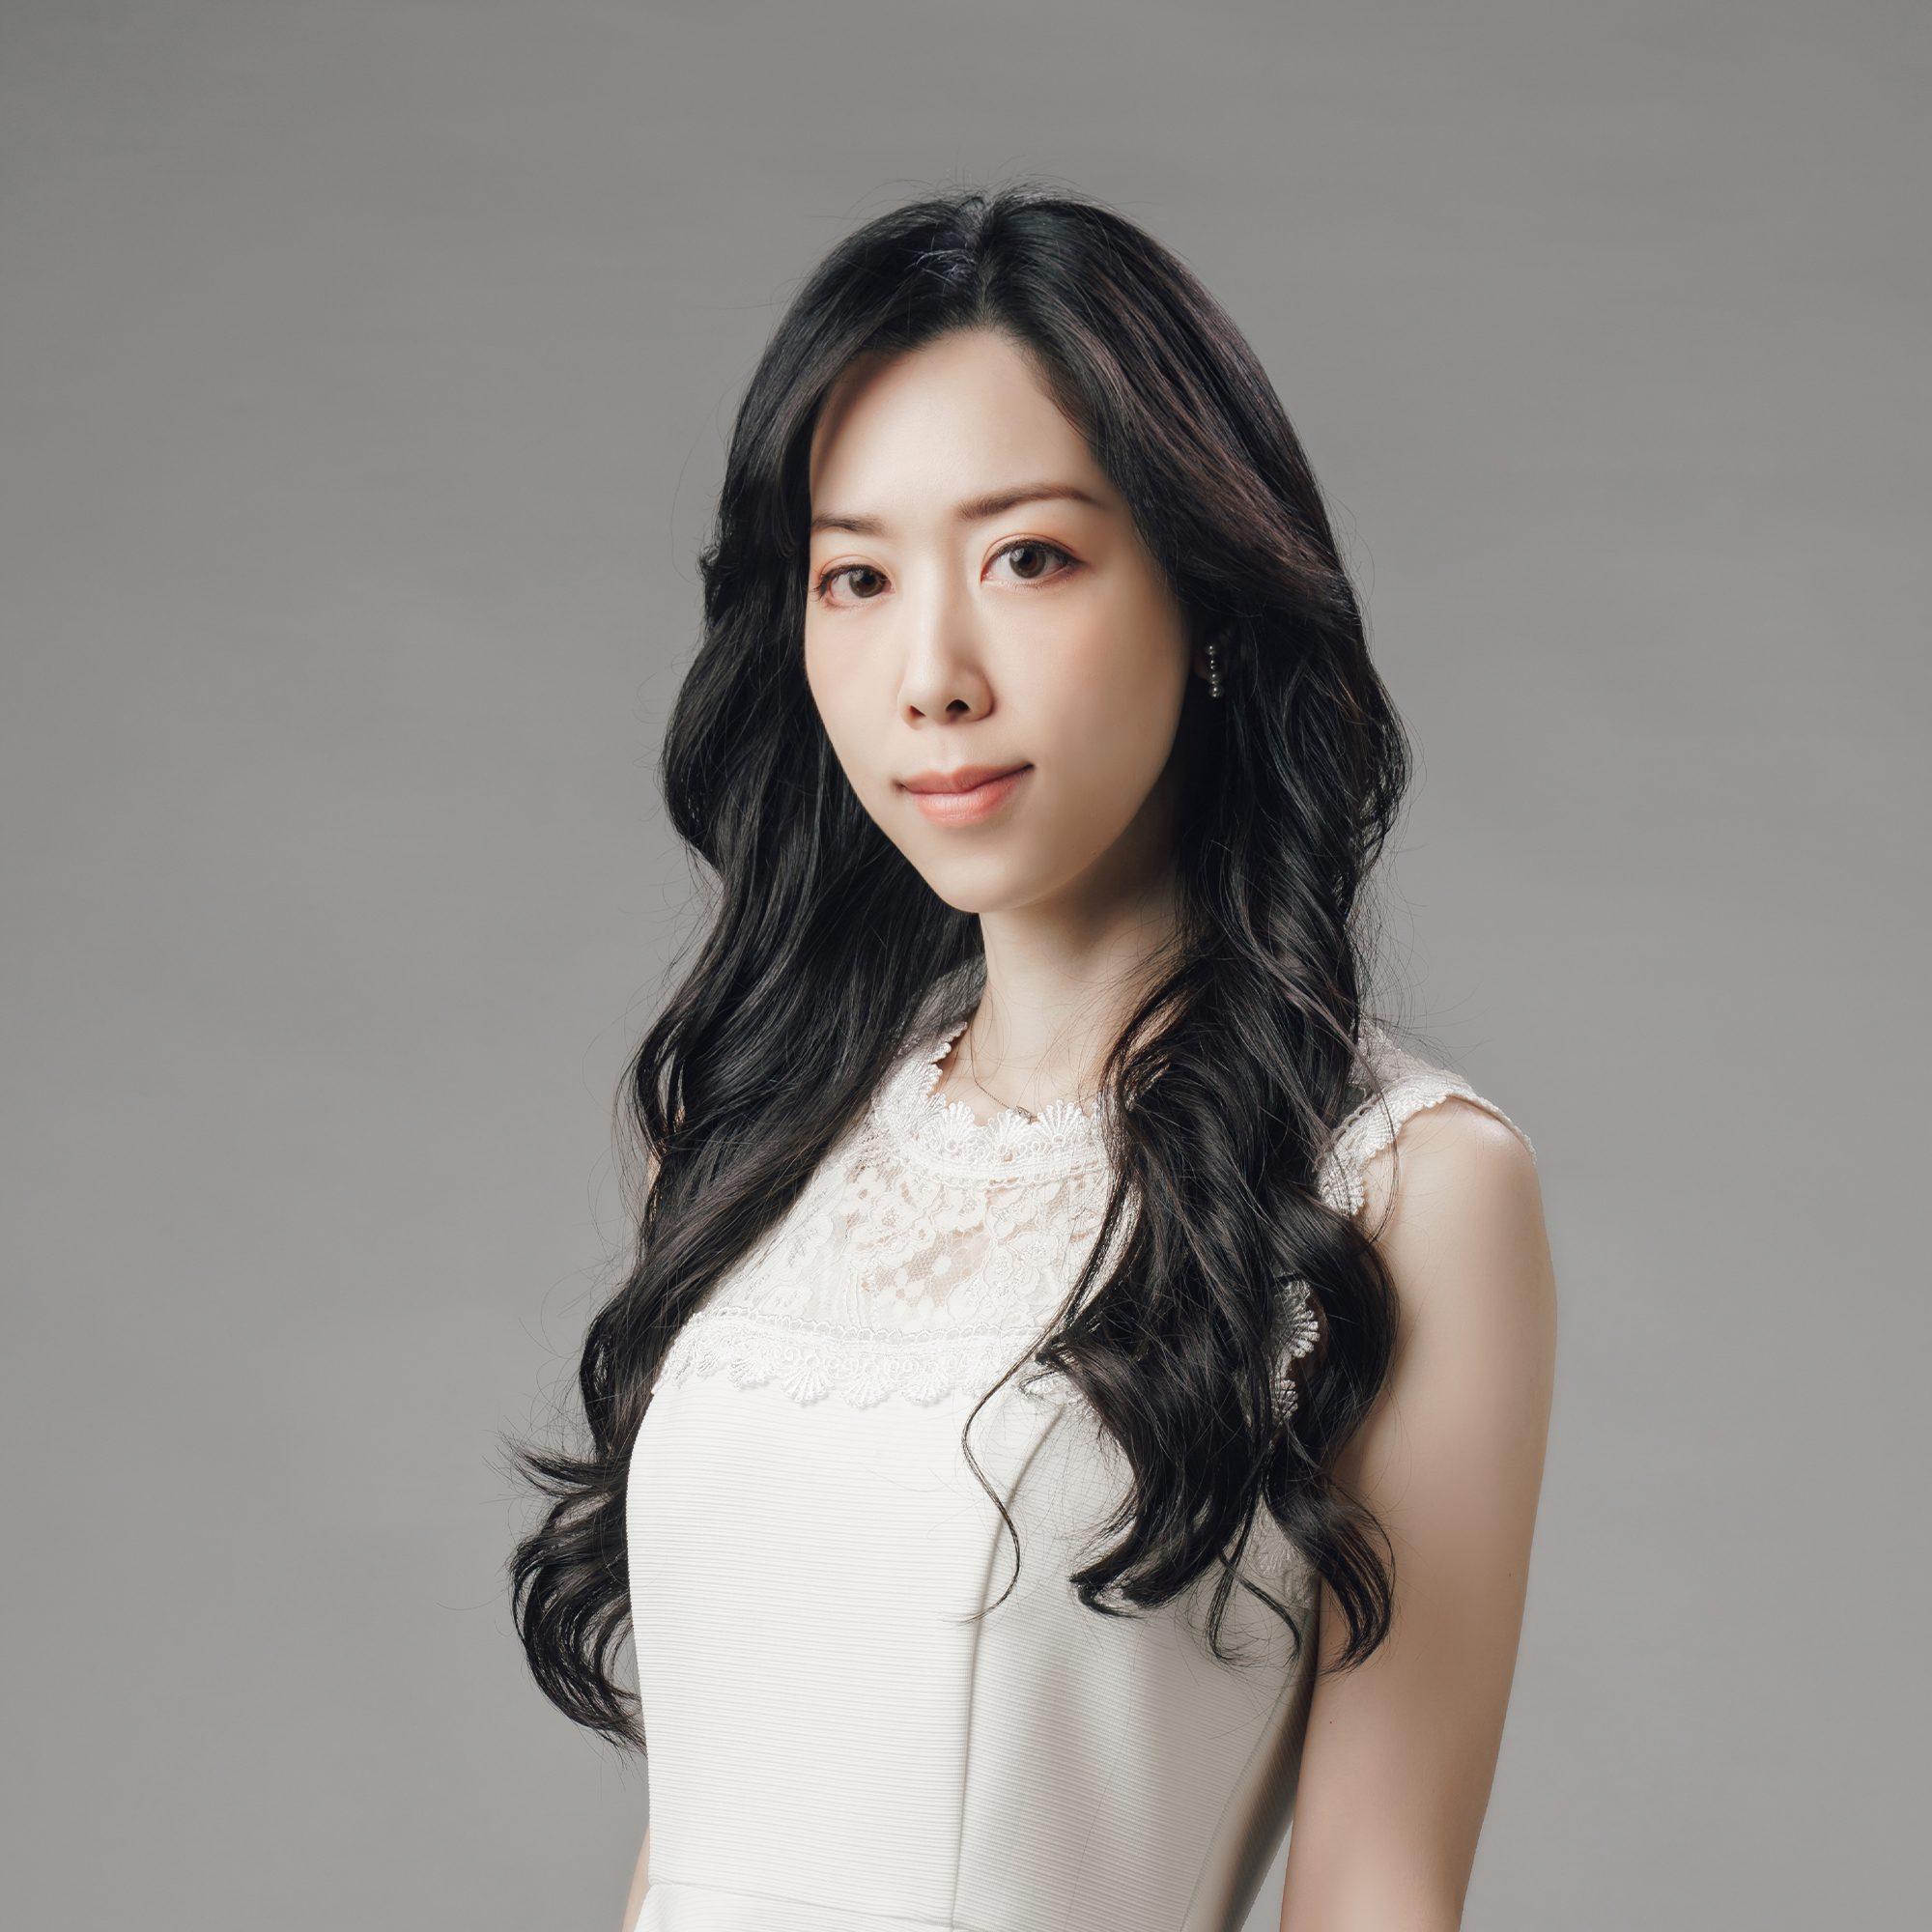 黃筠涵醫師V2